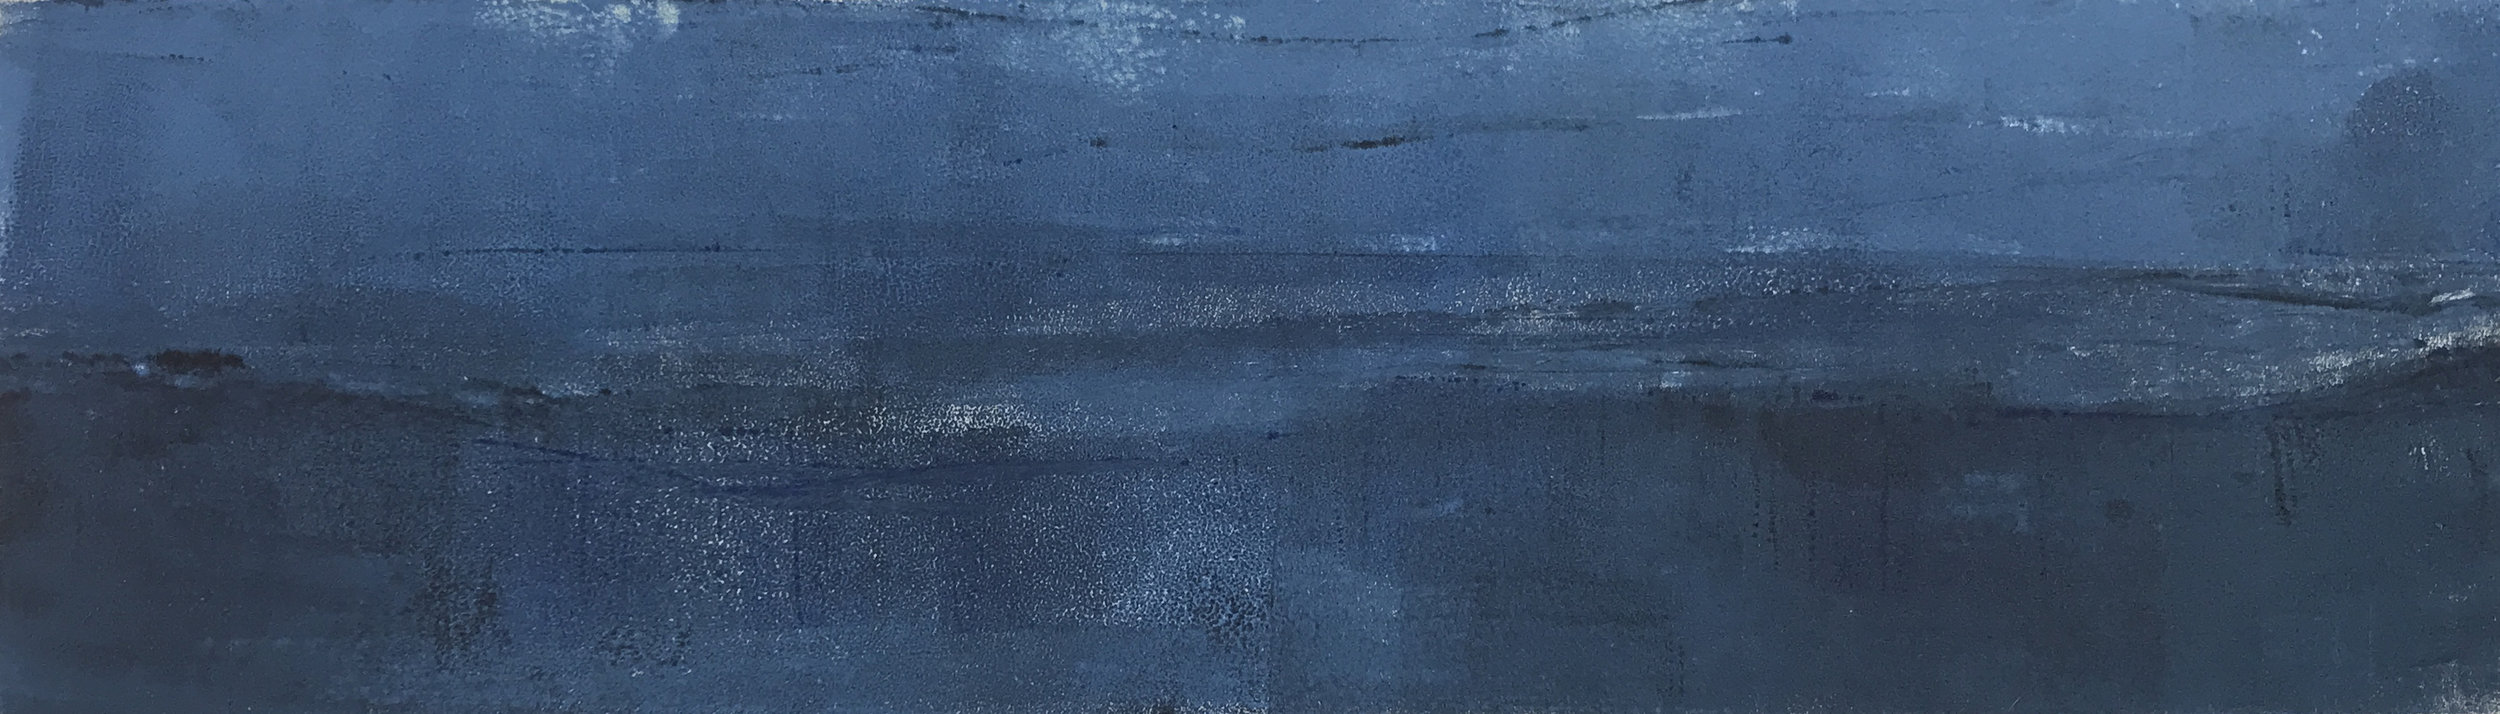 Seascape #4.JPG